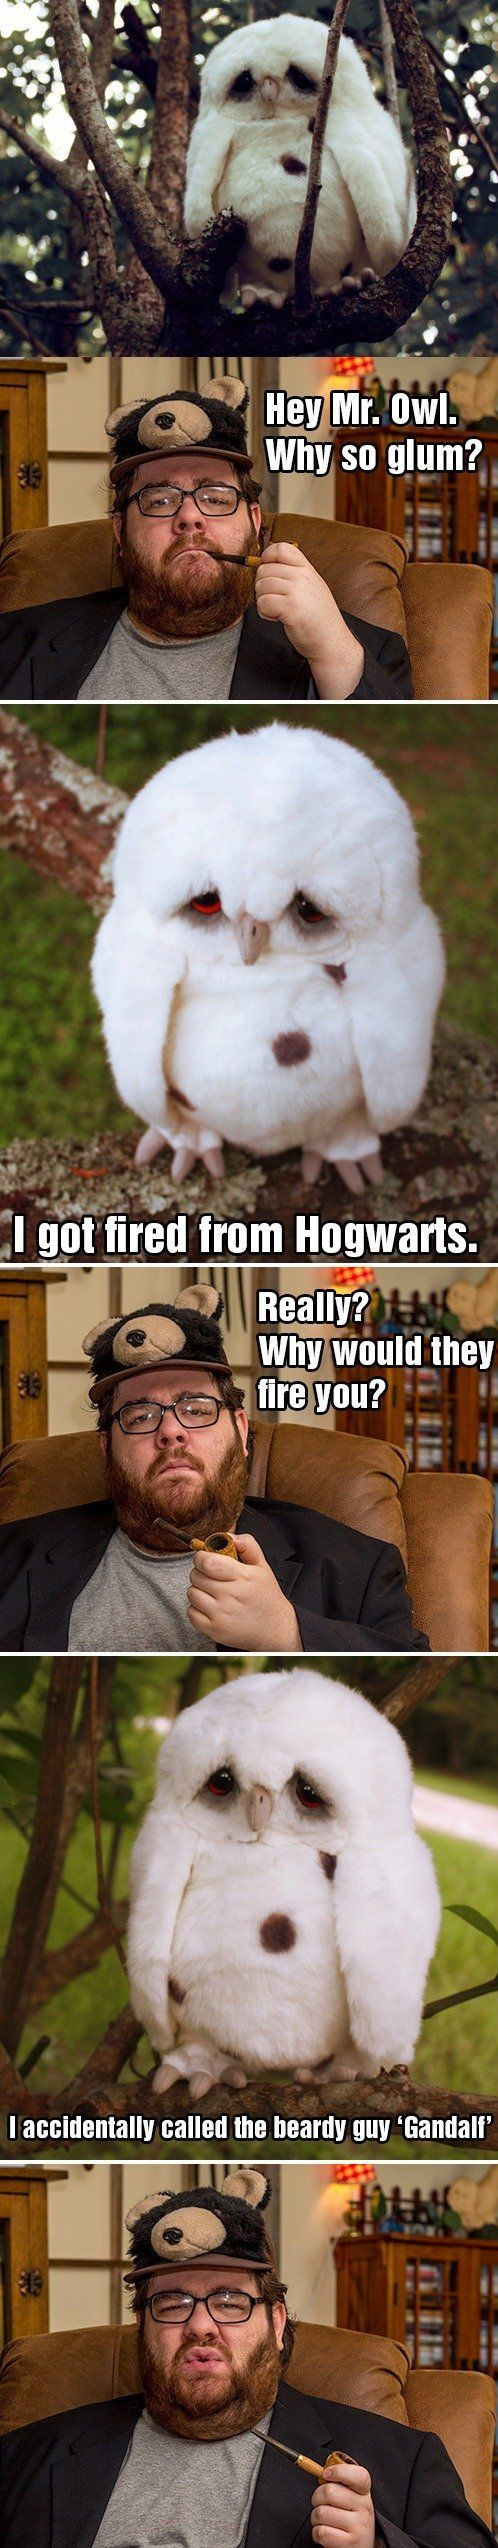 Hey Mr. Owl. Why so glum?: Glum, Hogwarts, Poor Owl, Funny Stuff, Funnies, Humor, Harry Potter, Owls, Sad Owl